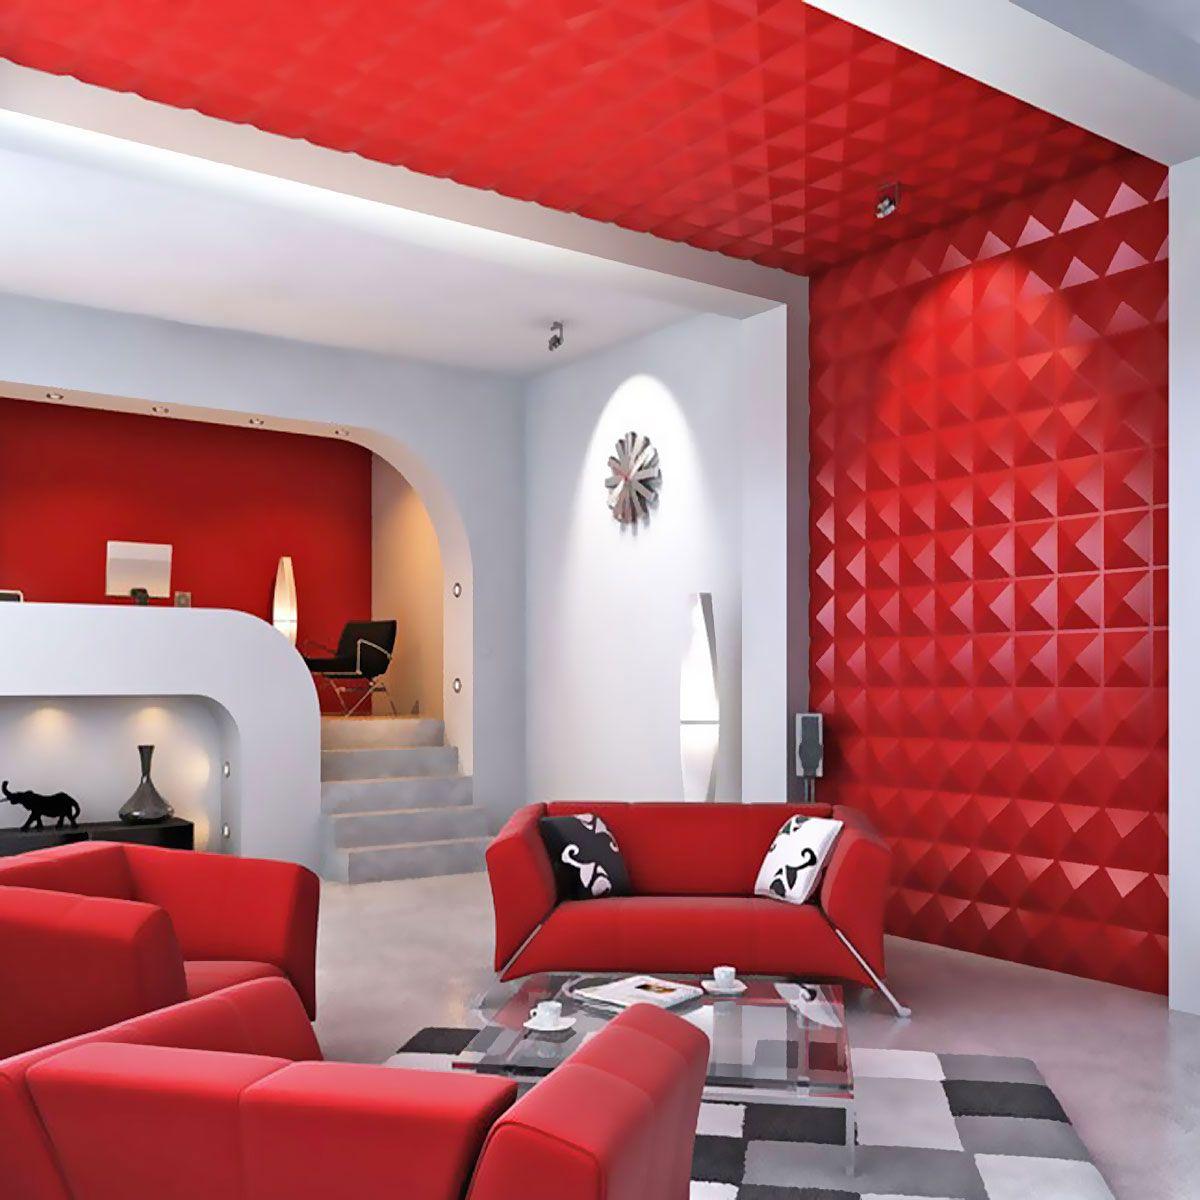 Decorative Wall Tiles For Living Room Pleasing 19 58Inch W X 19 58Inch H Richmond Endurawall Decorative 3D Design Ideas